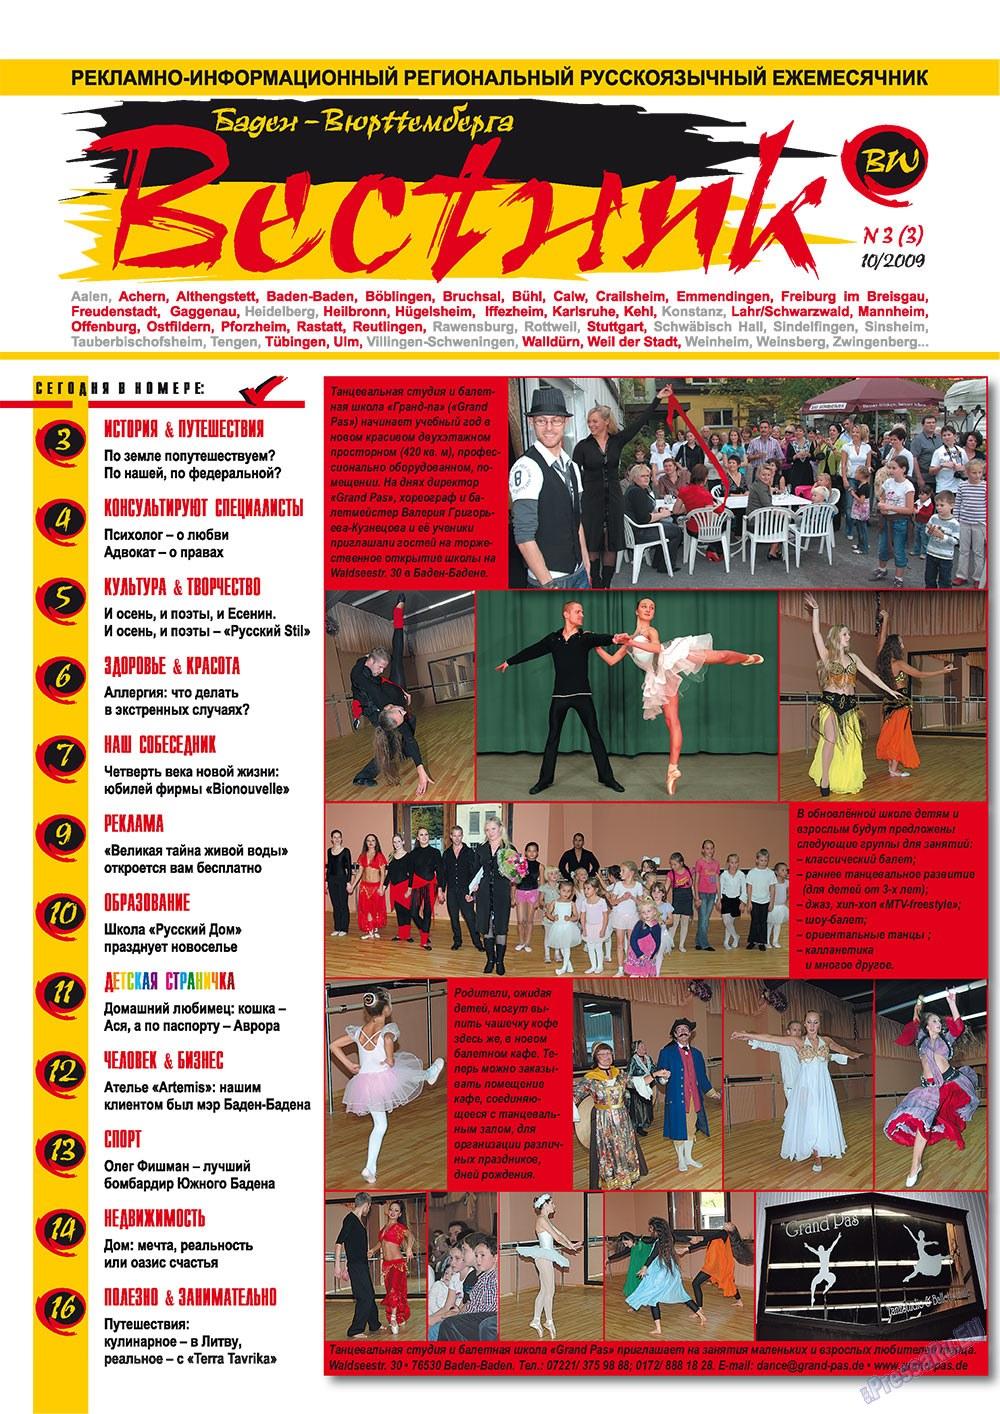 Вестник-info (журнал). 2009 год, номер 3, стр. 1